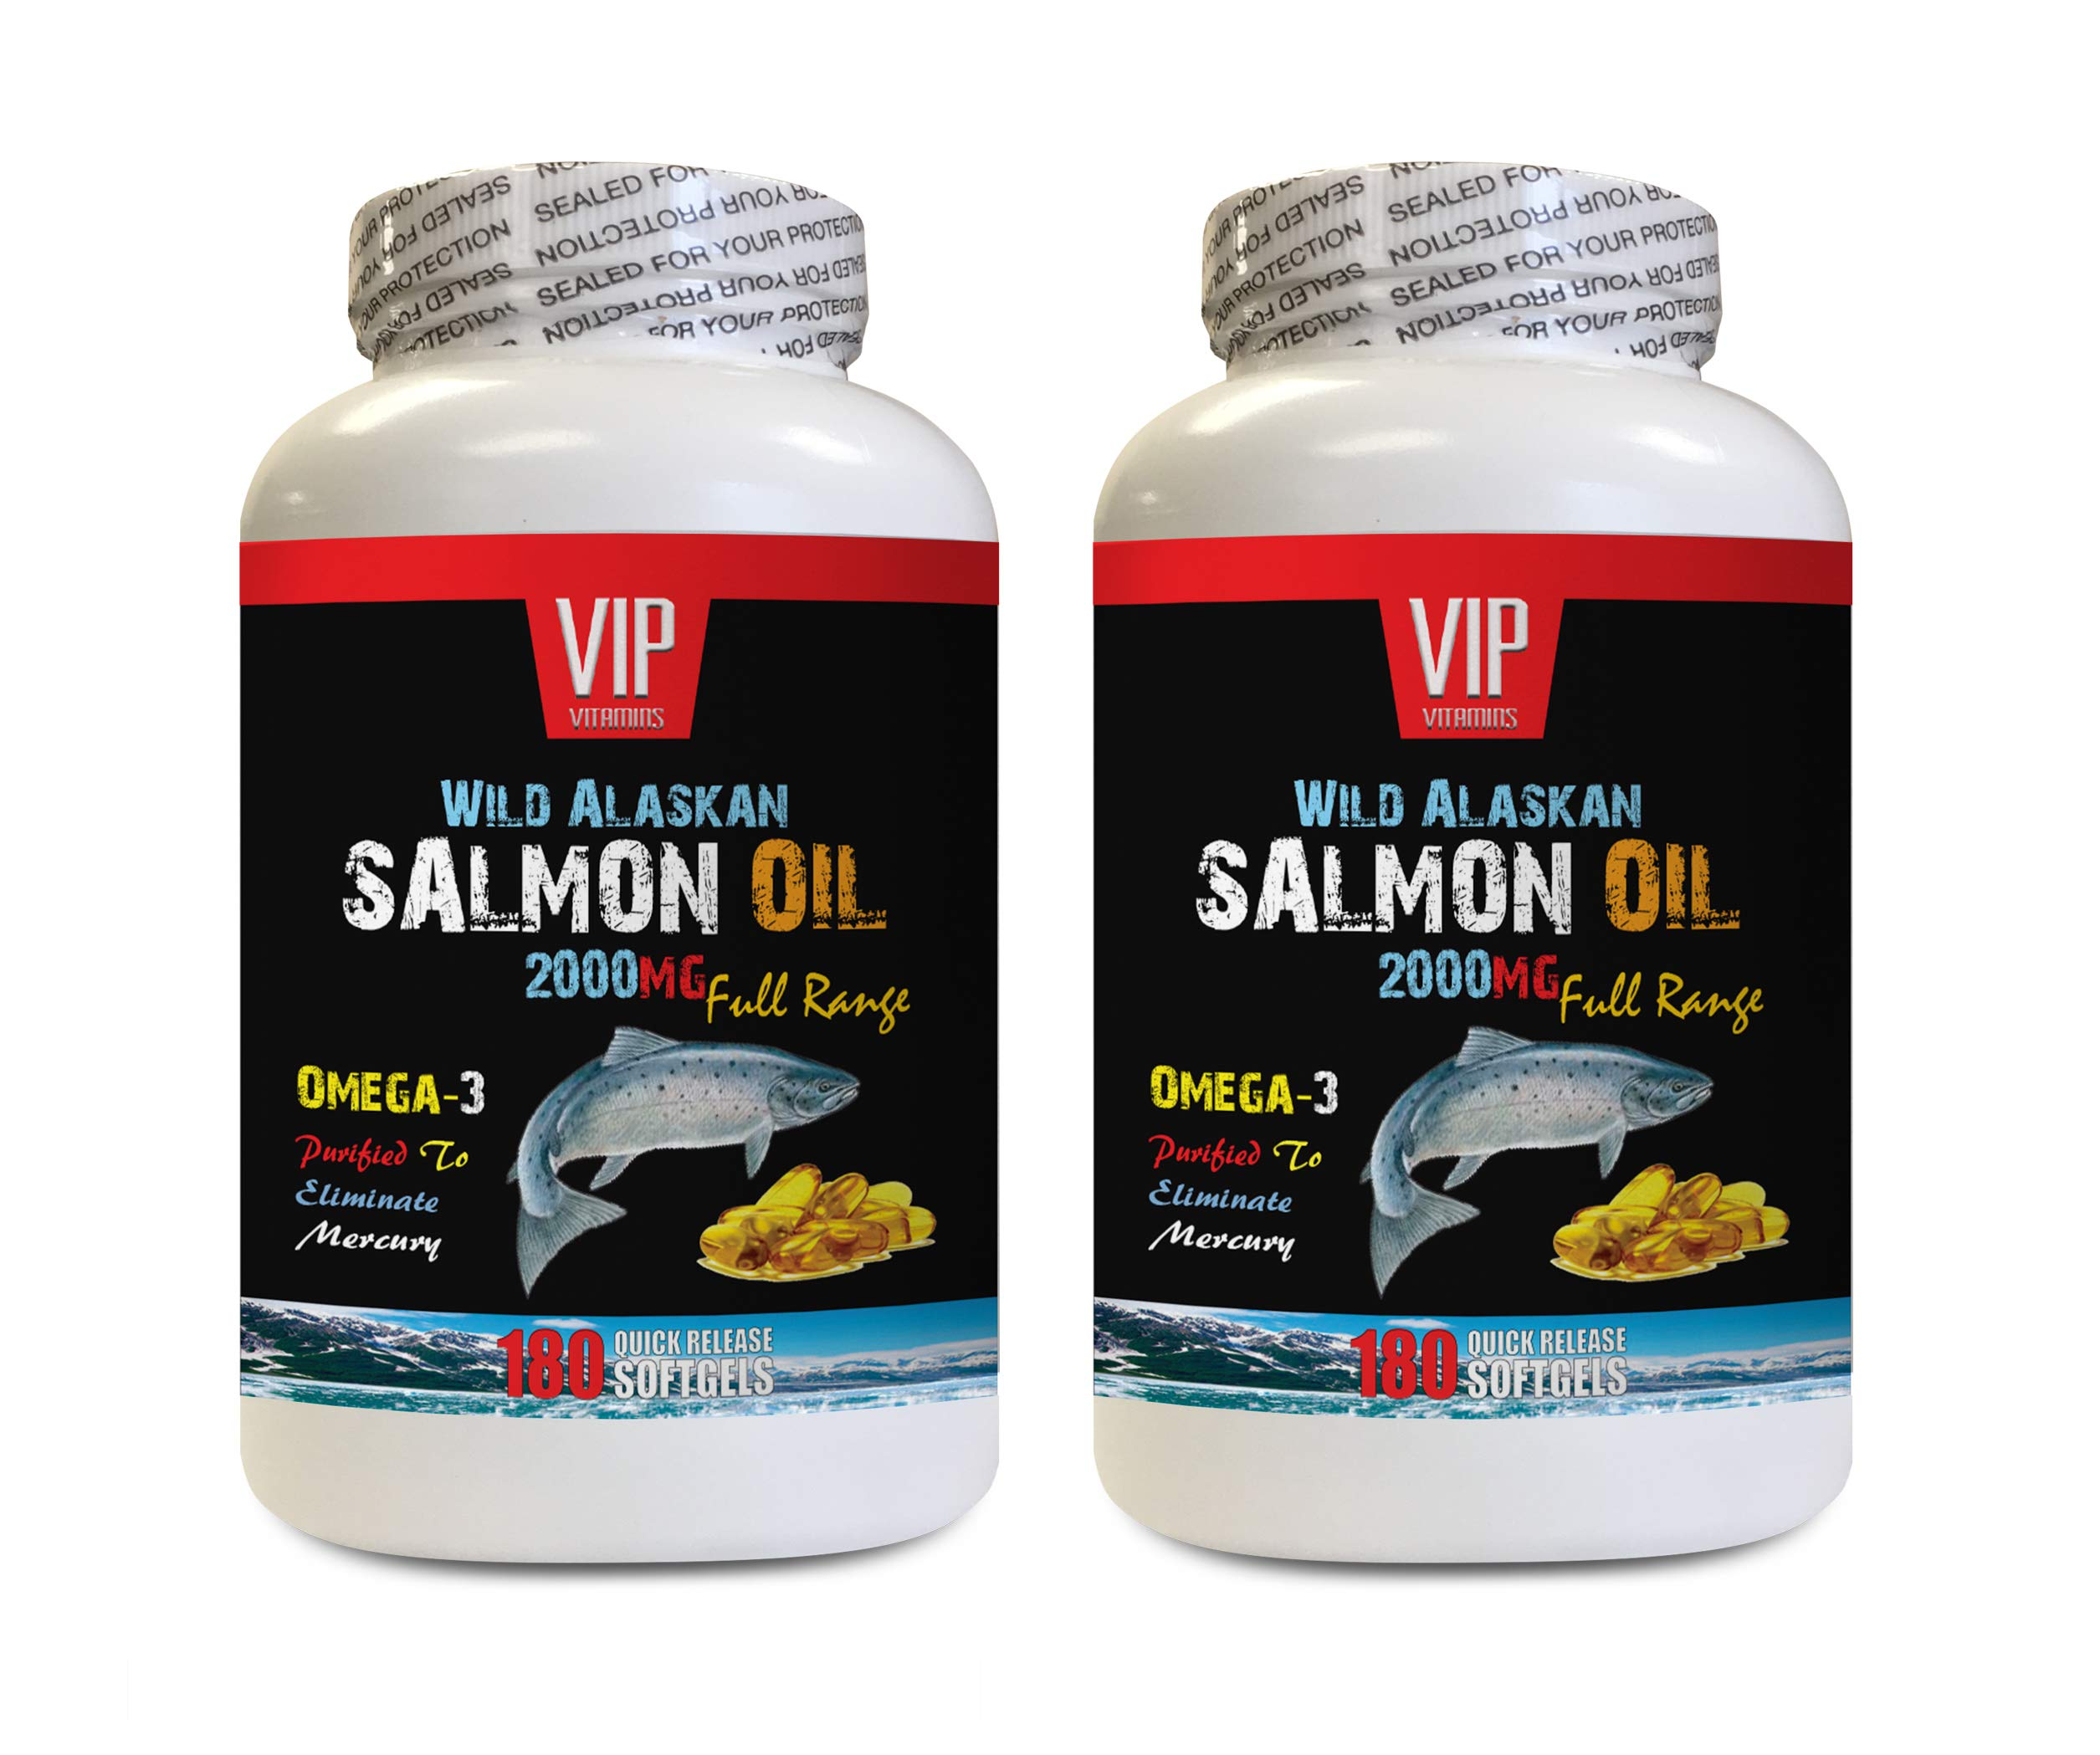 Heart Health Supplements - Wild Alaskan Salmon Oil 2000MG - Full Range - Omega 3 Fish Oil Cardio Health - 2 Bottles 360 Softgels